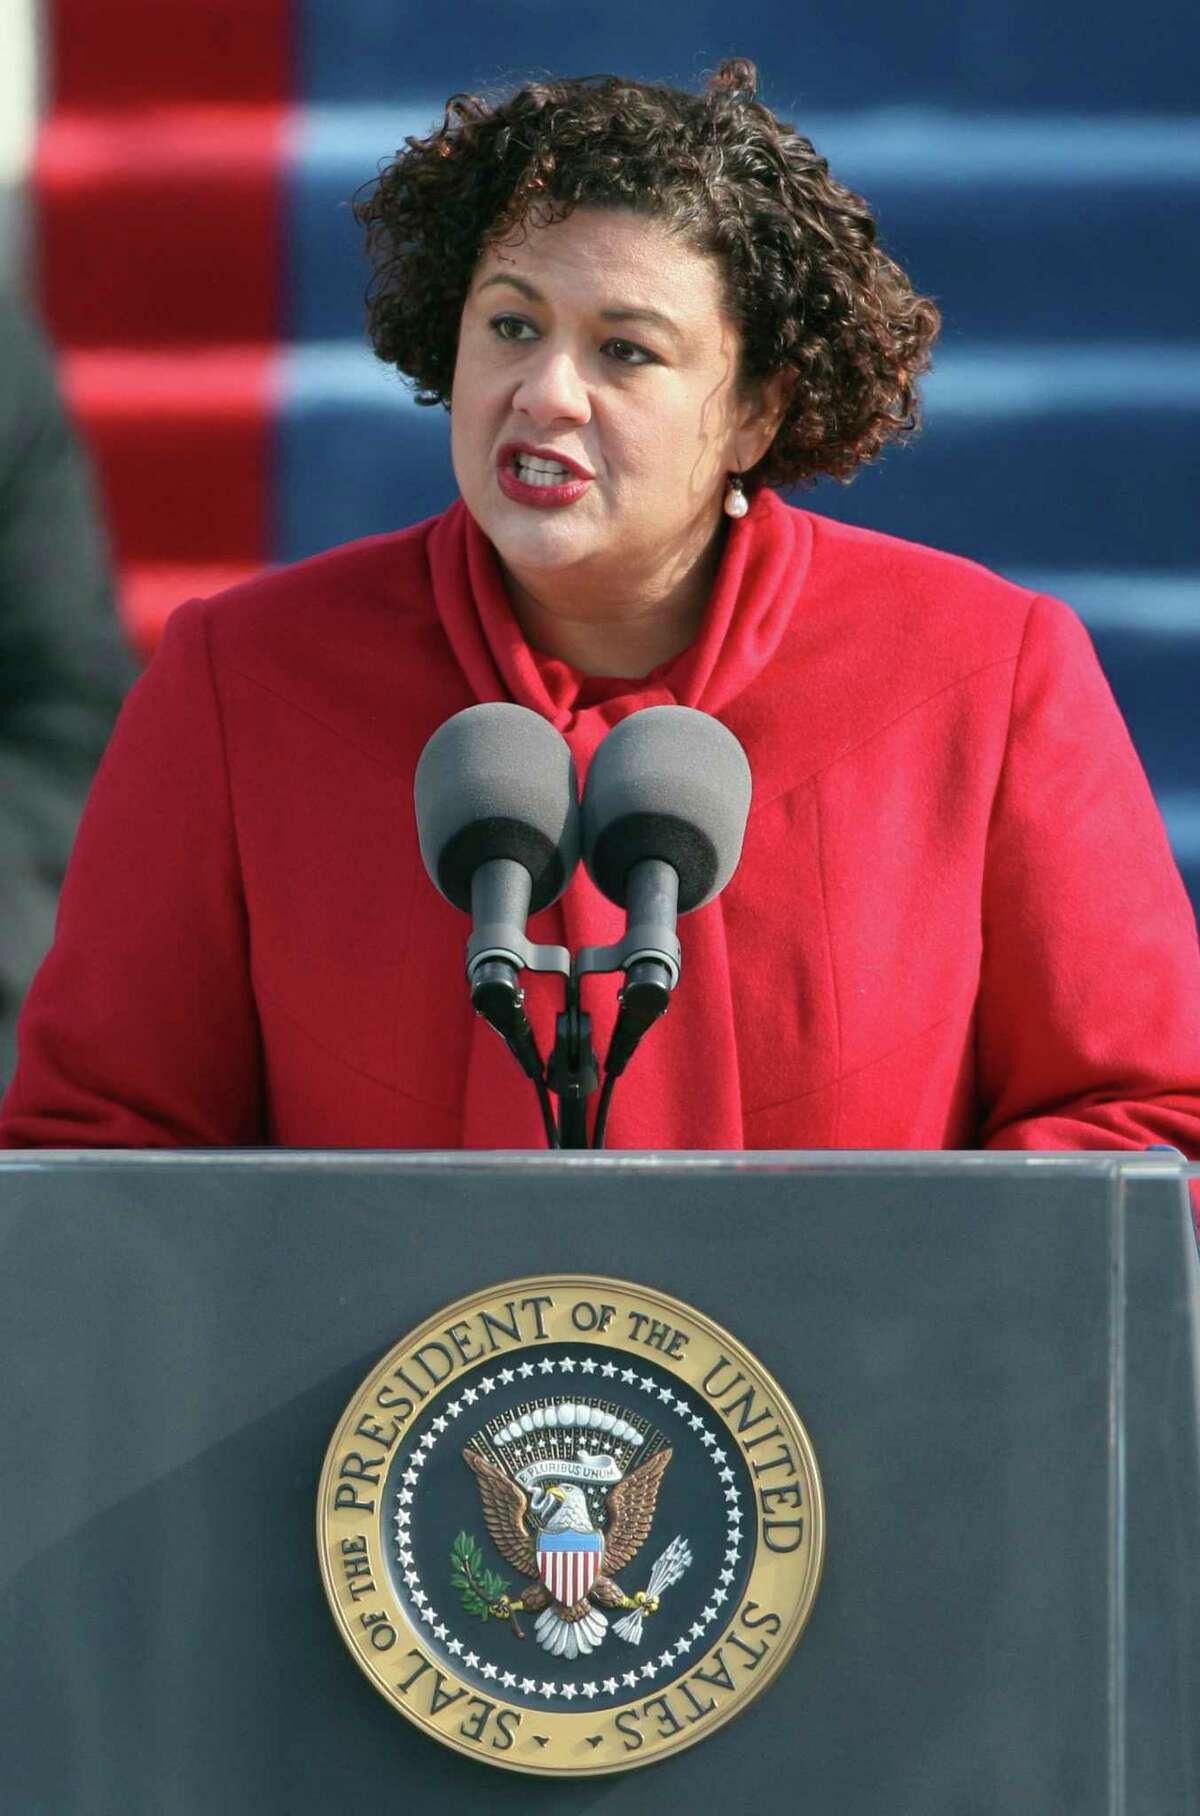 Elizabeth Alexander recites a poem at President Barack Obama's inauguration in 2009.